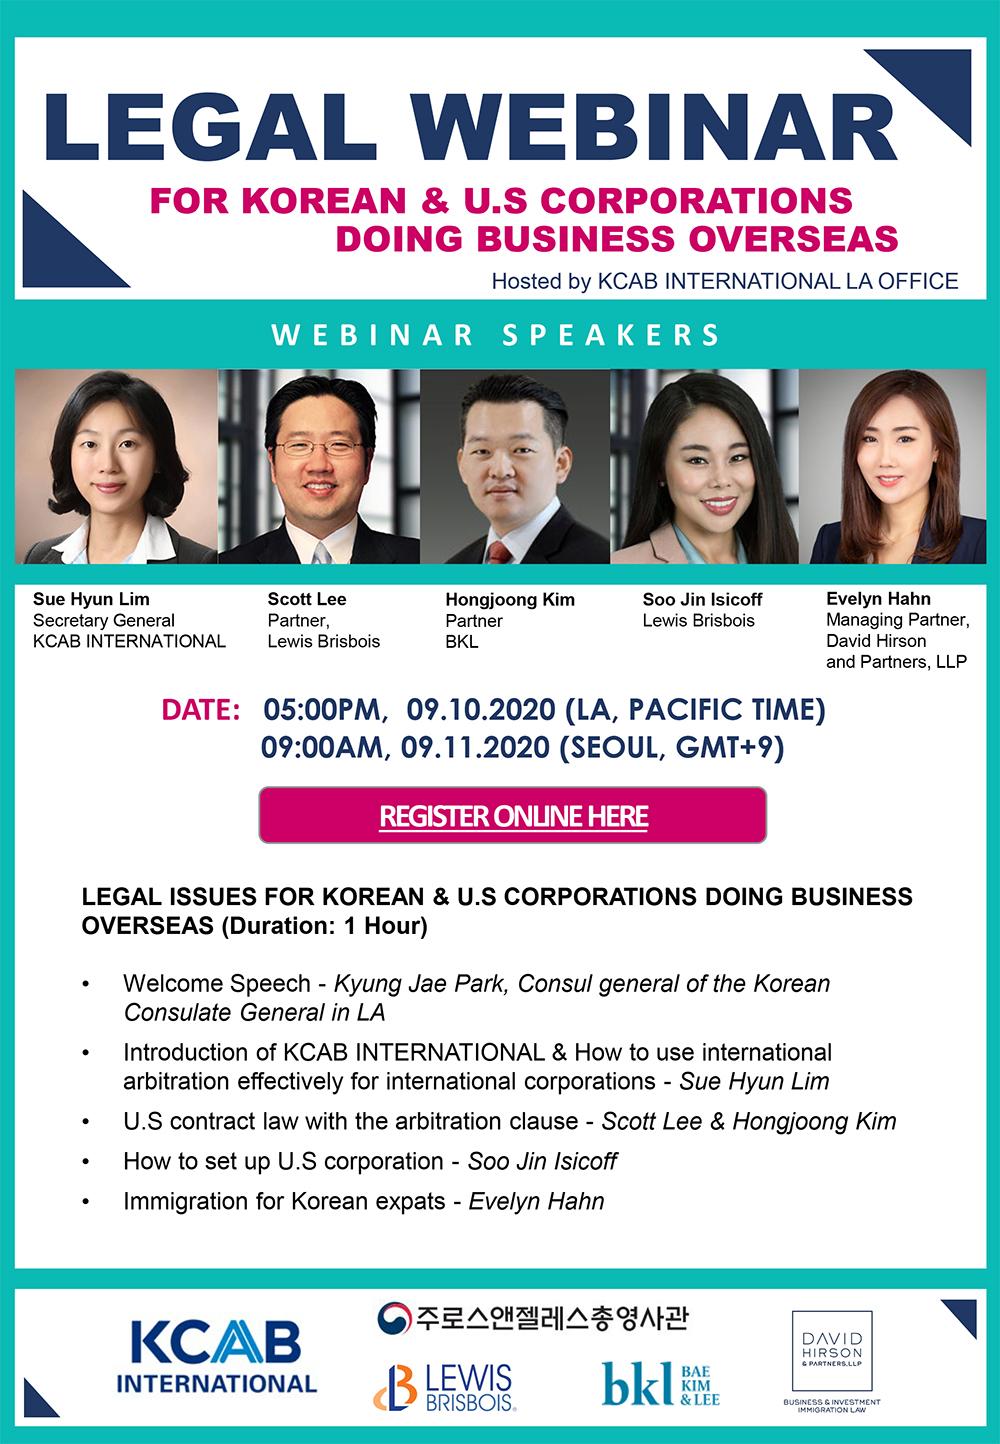 [KCAB INTERNATIONAL] Legal Webinar for Korean & U.S Corporations doing business overseas